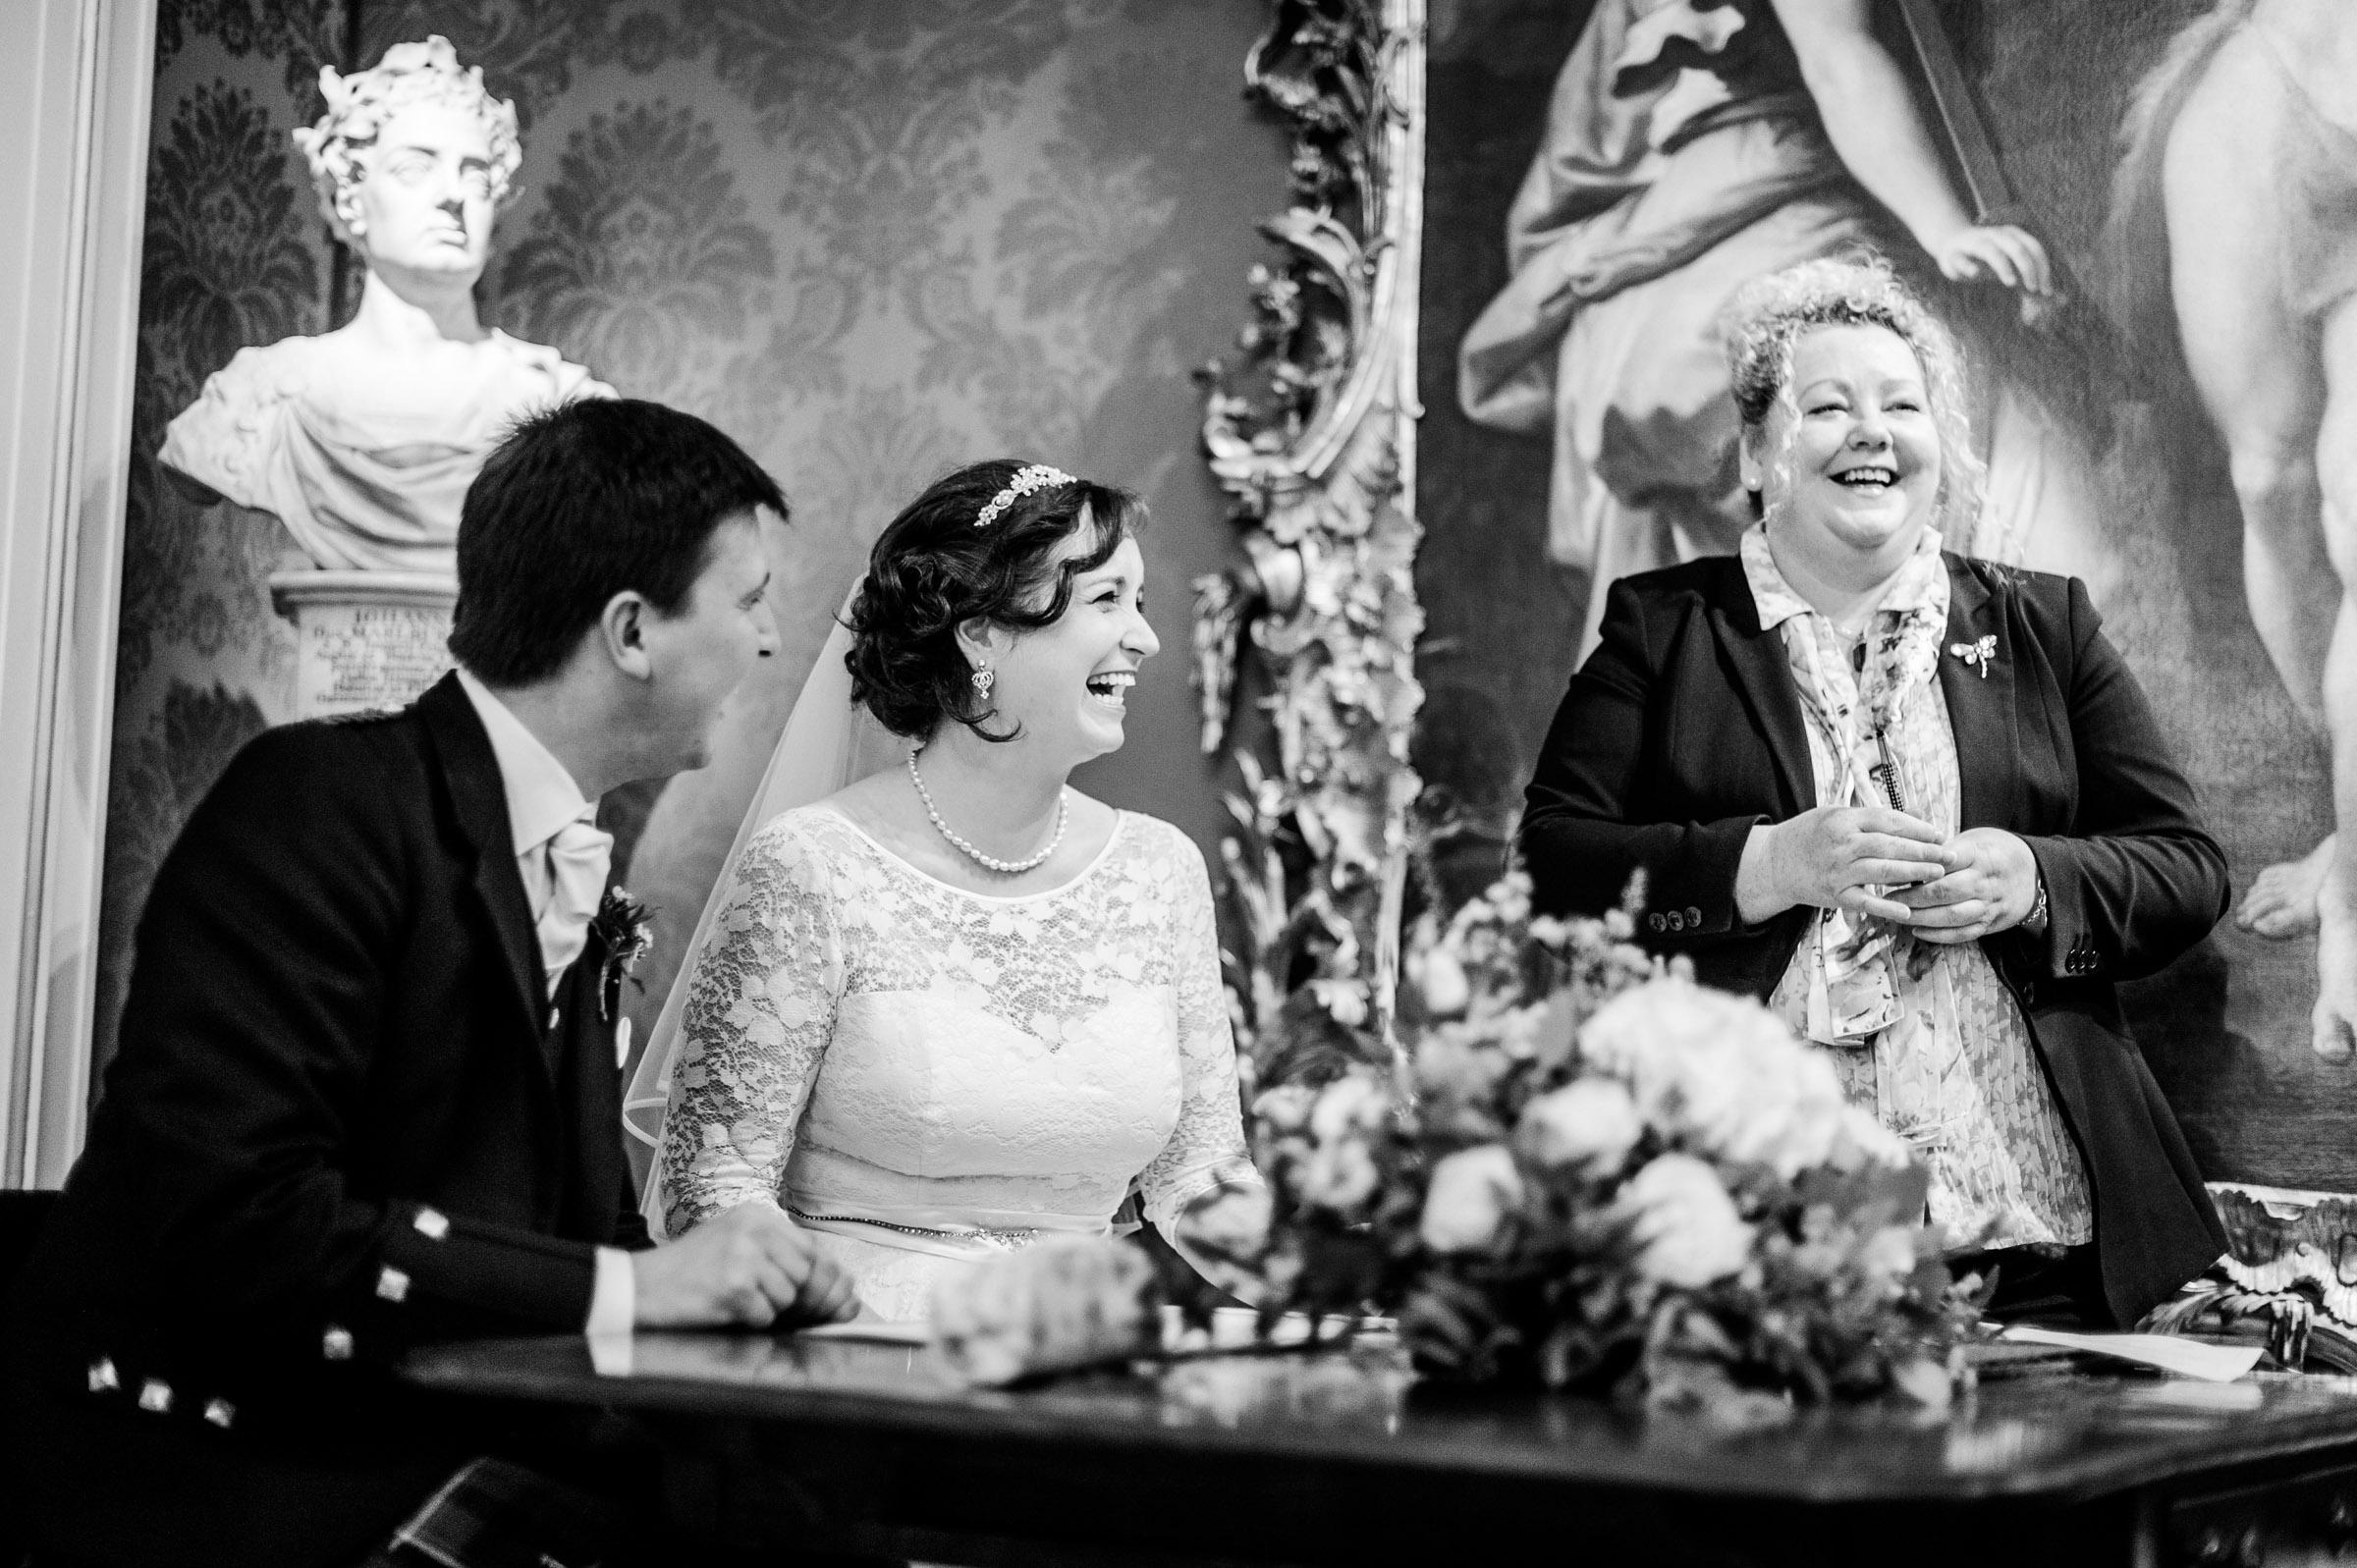 Ashmolean-Museum-Wedding-Pictures-0029.jpg